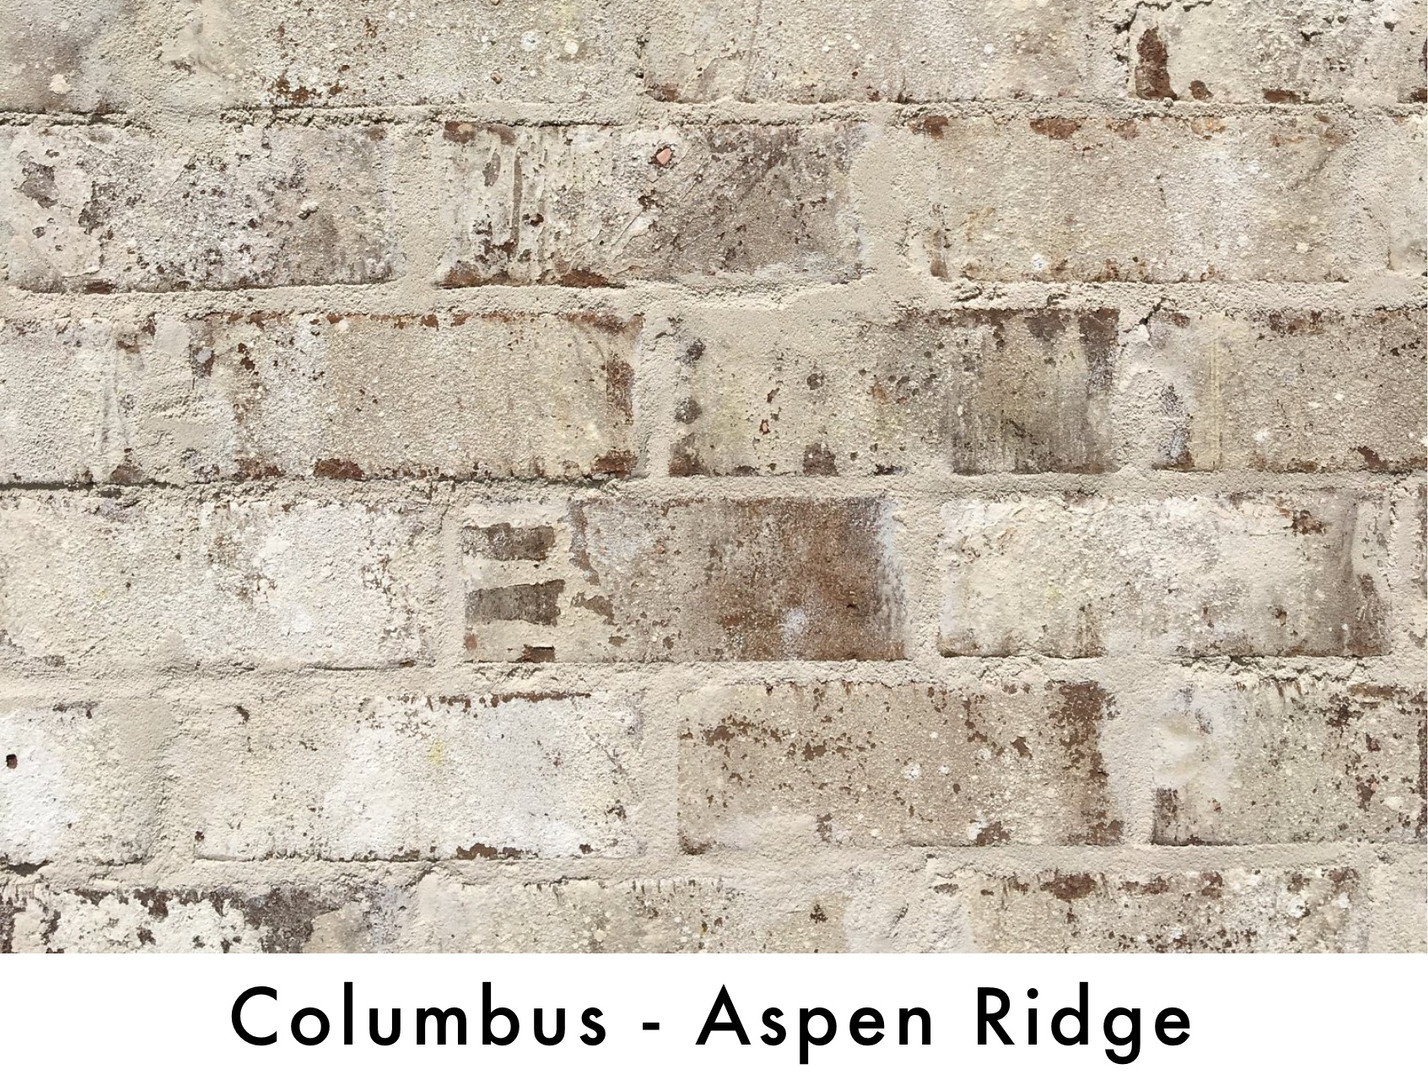 ColumbusAspenRidge.jpg